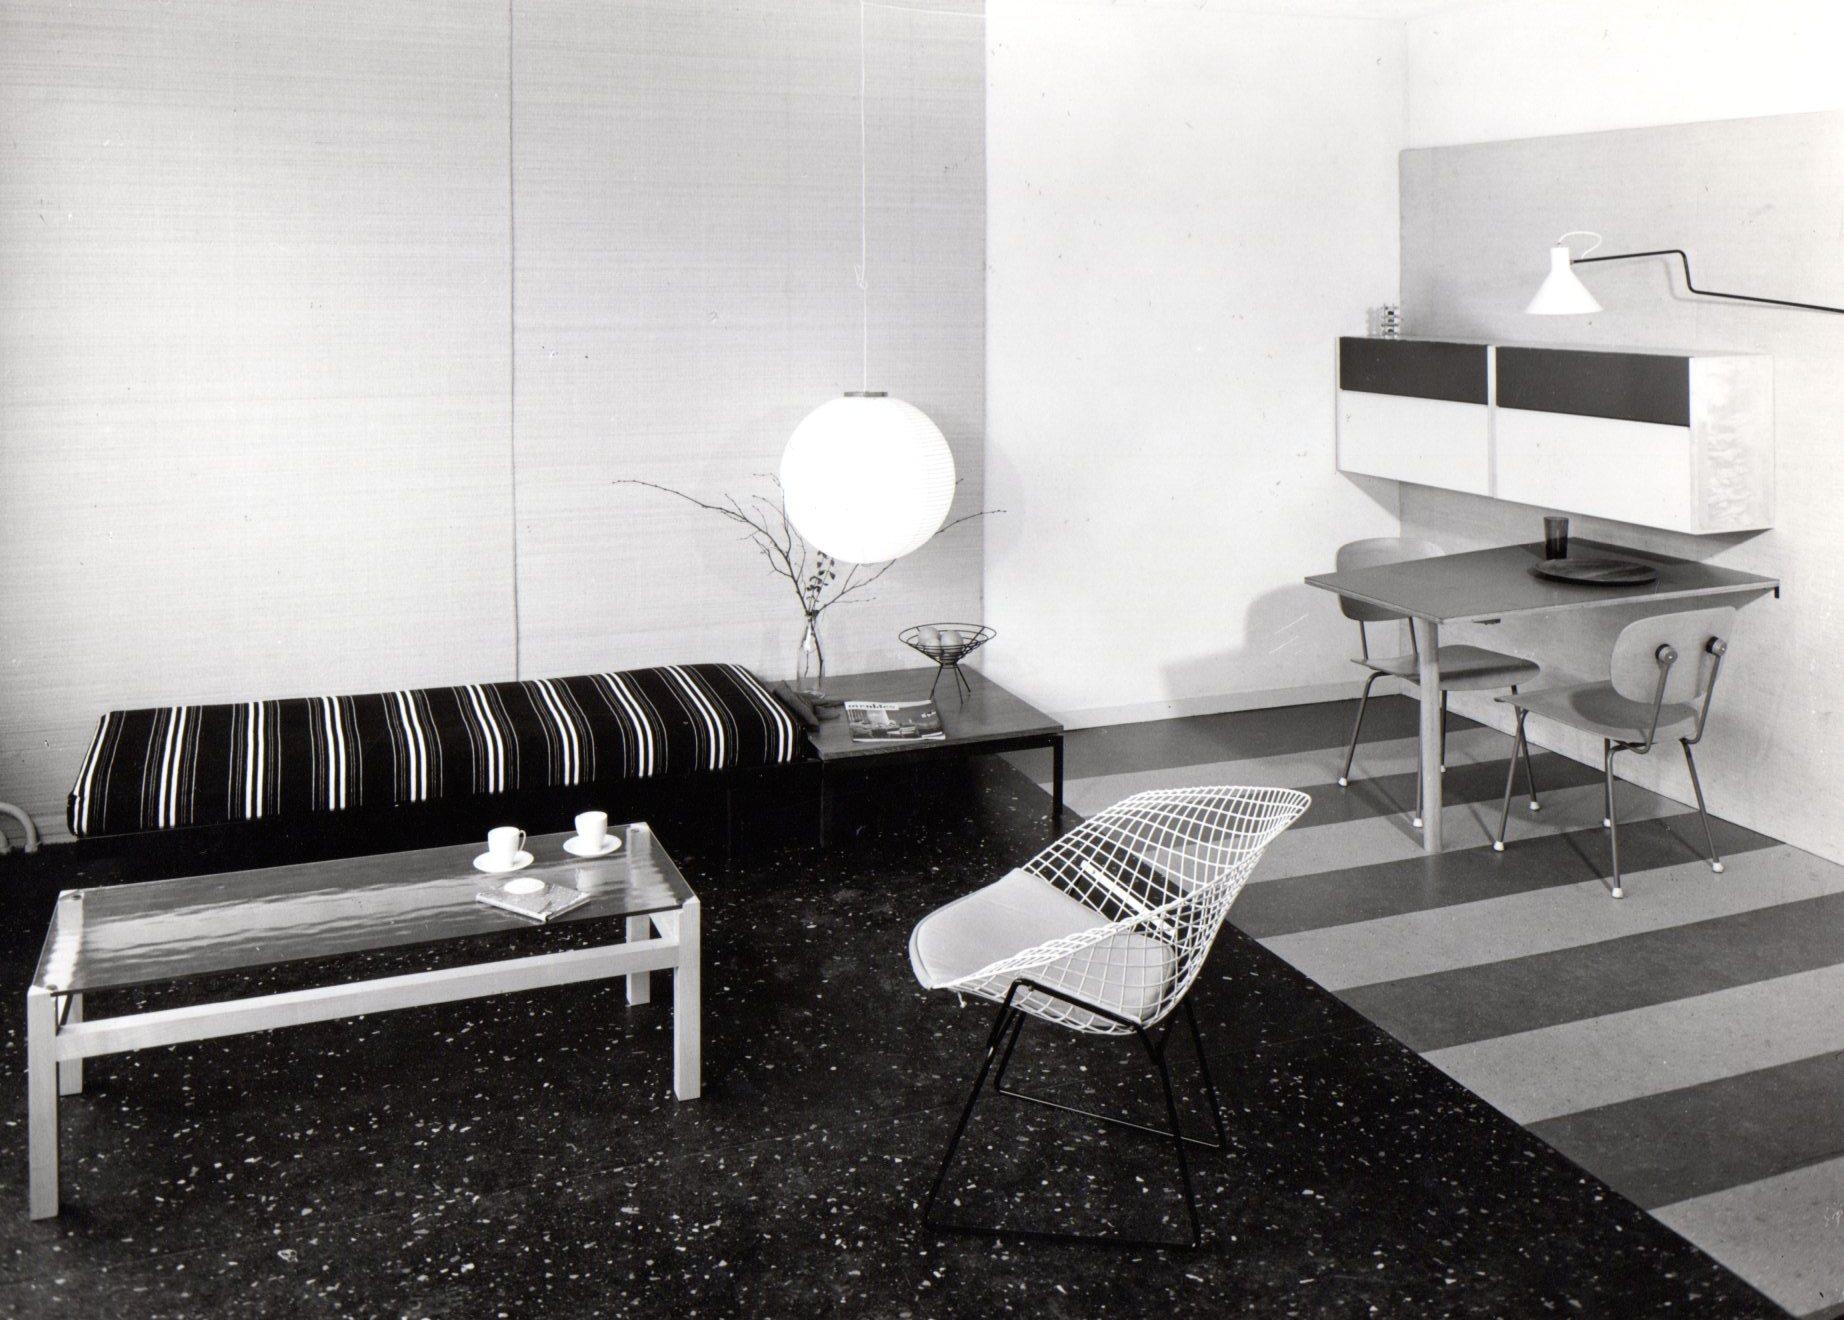 Model home in Corversbos apartment building. Table Lageveen under the lamp, table Langerak on the left. Photo Jan Versnel